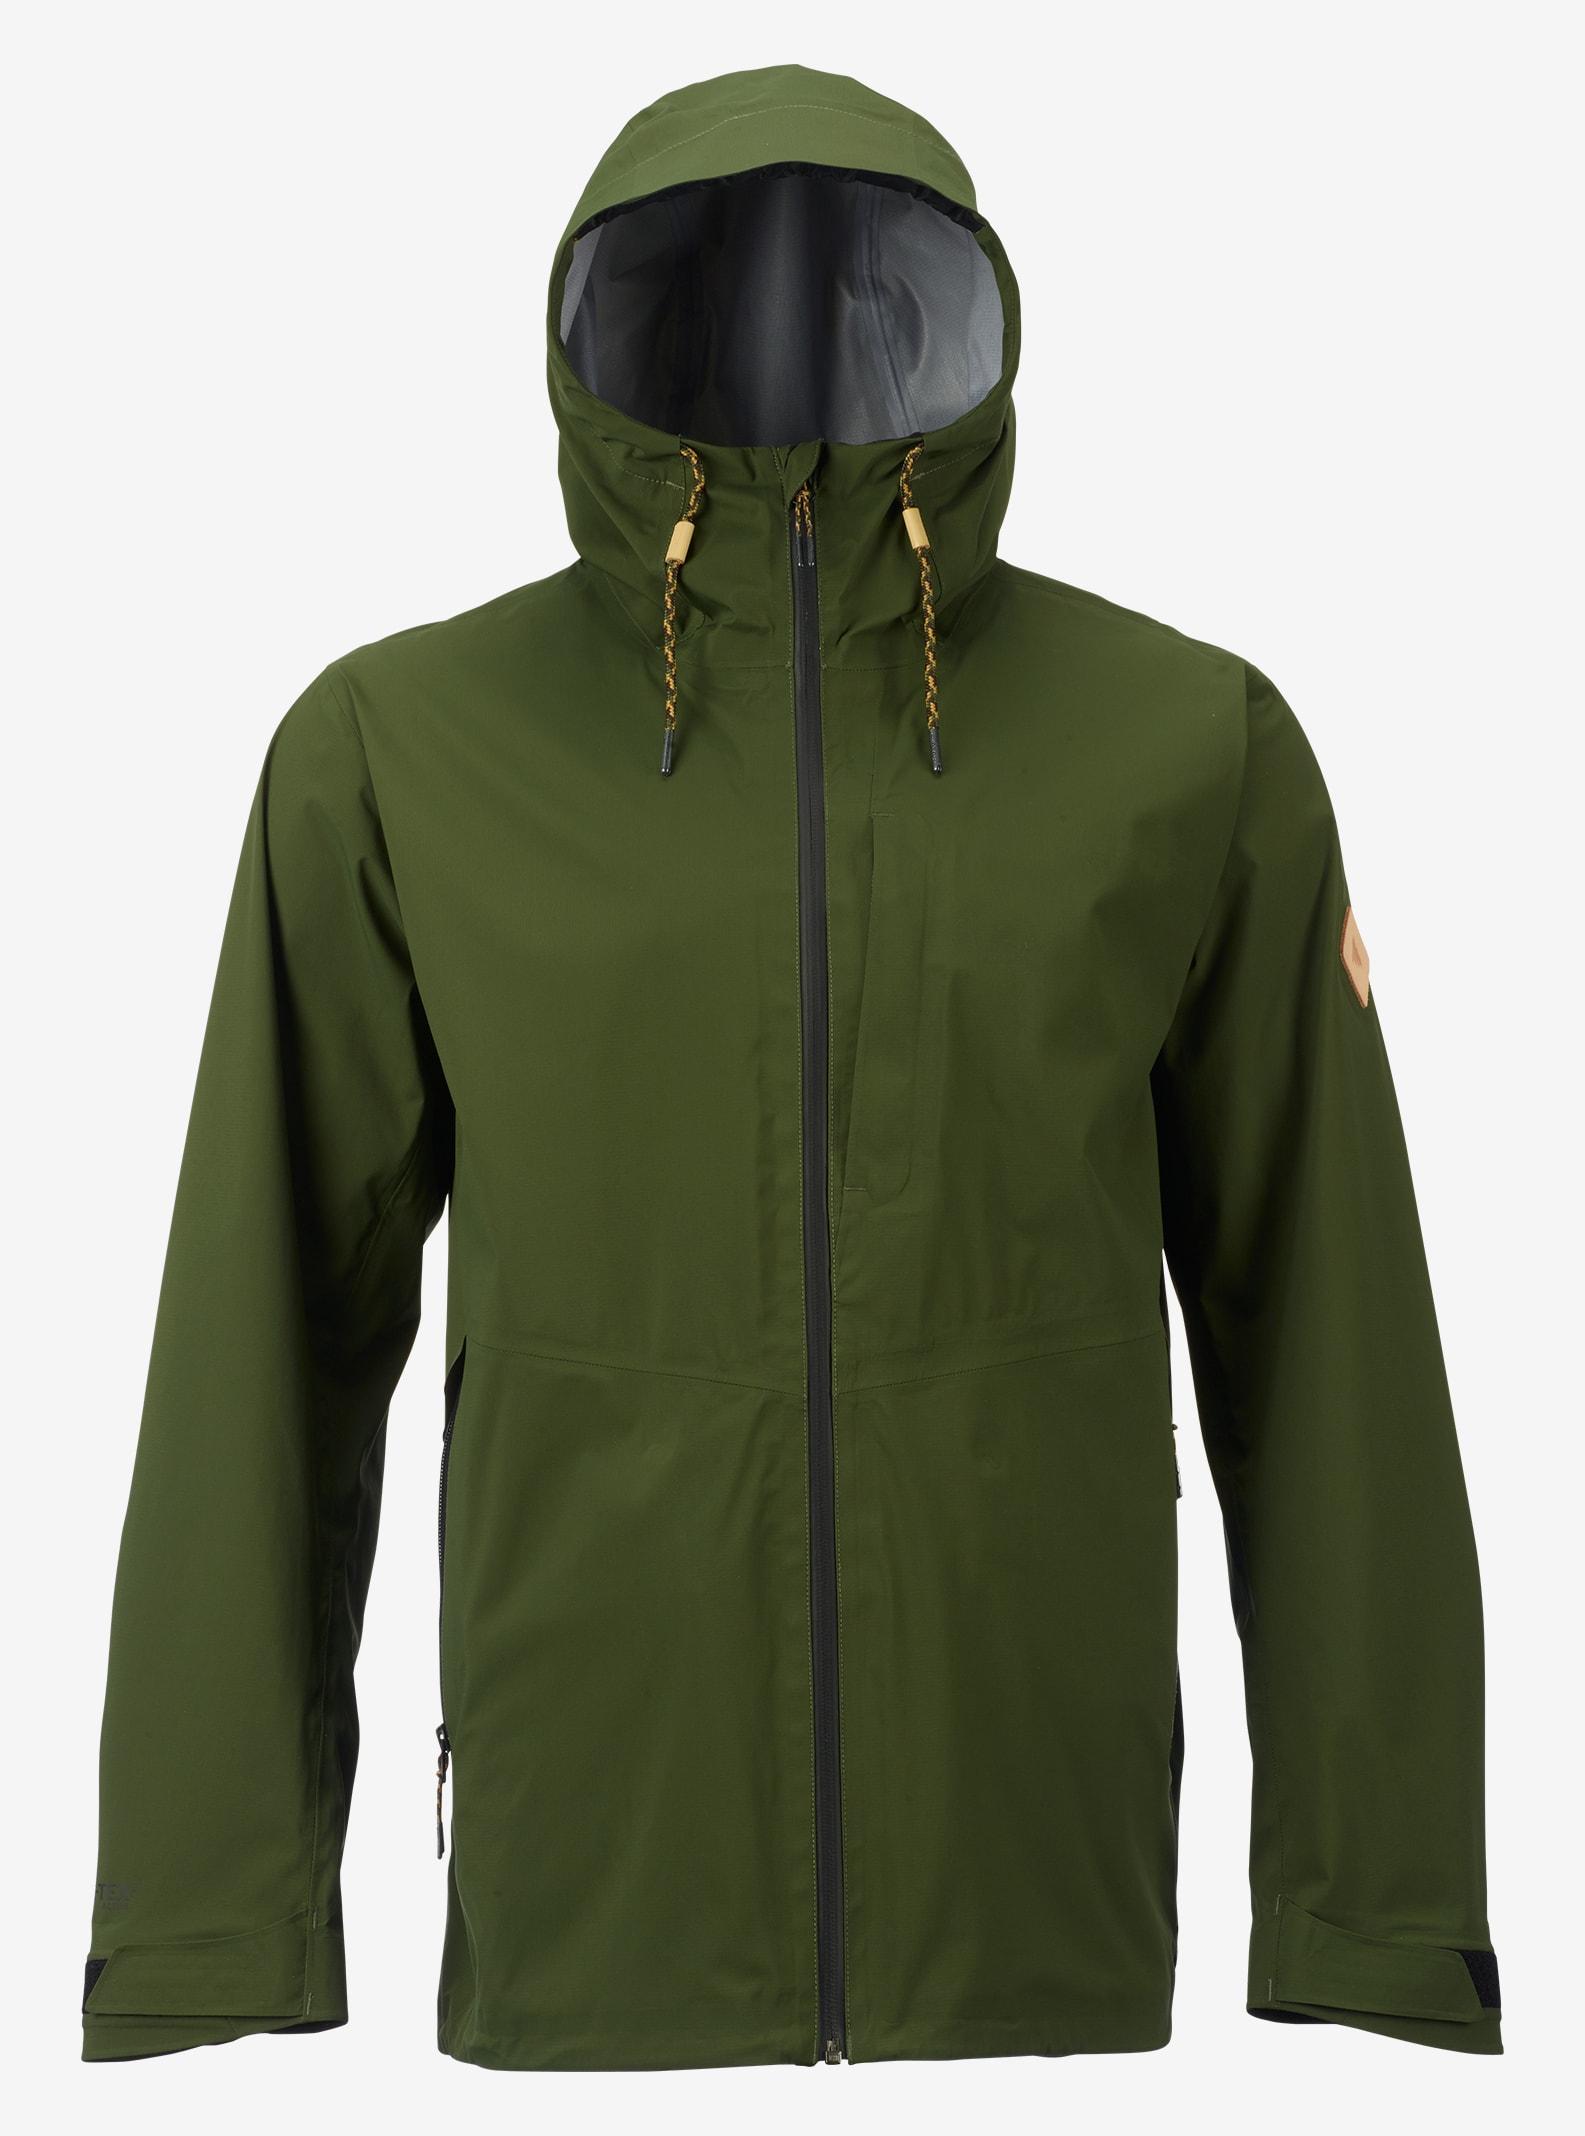 Burton GORE-TEX® 3L Sterling Rain Jacket shown in Rifle Green